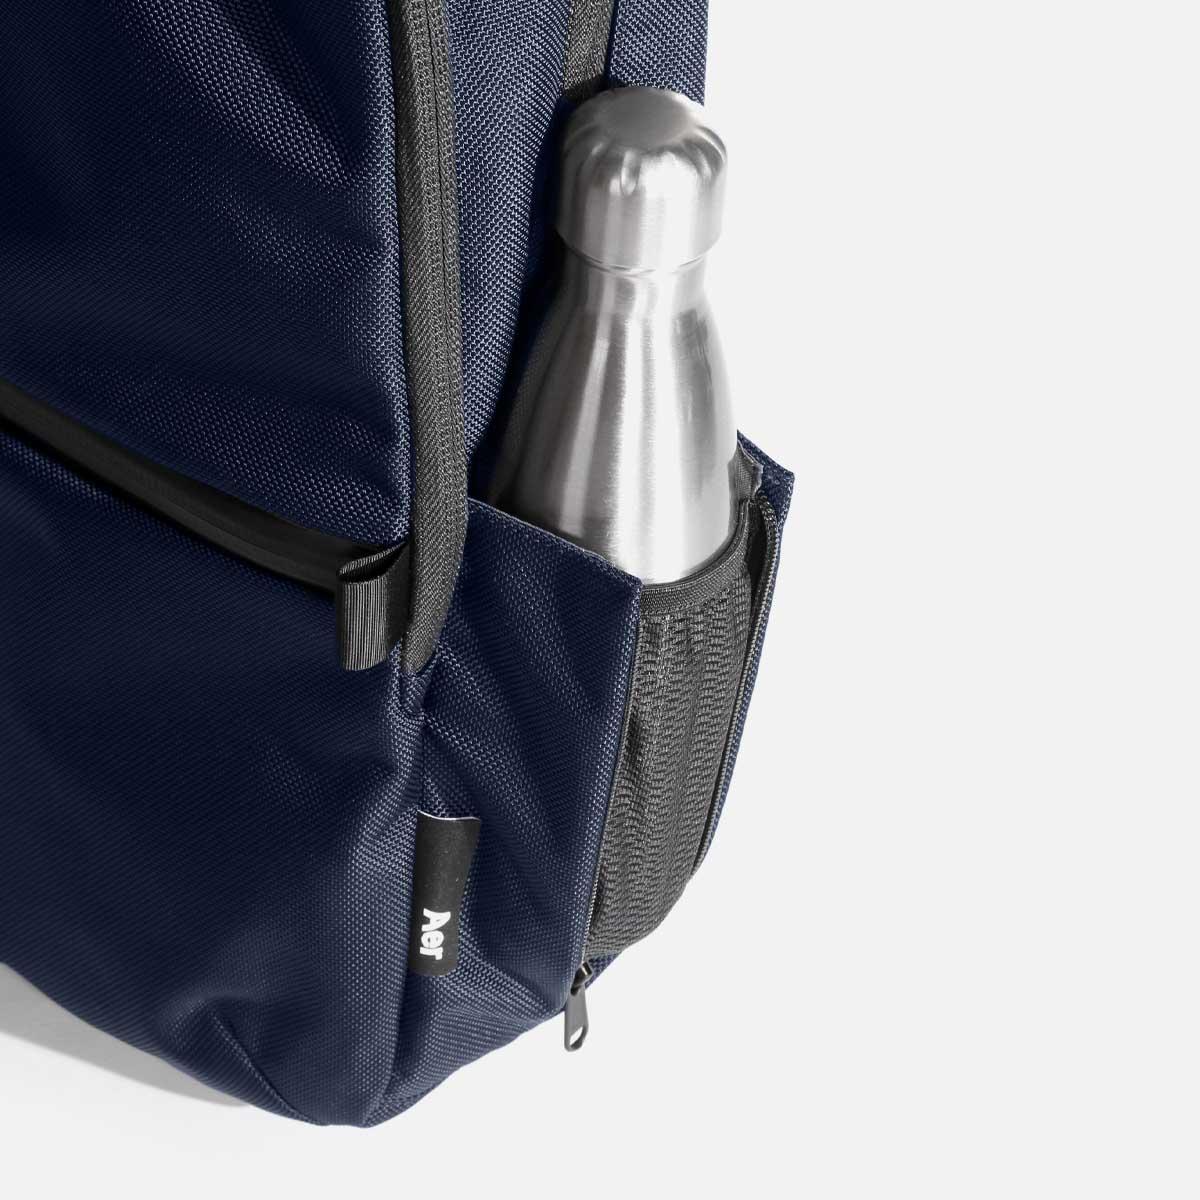 Expandable pocket for bottles or umbrellas.